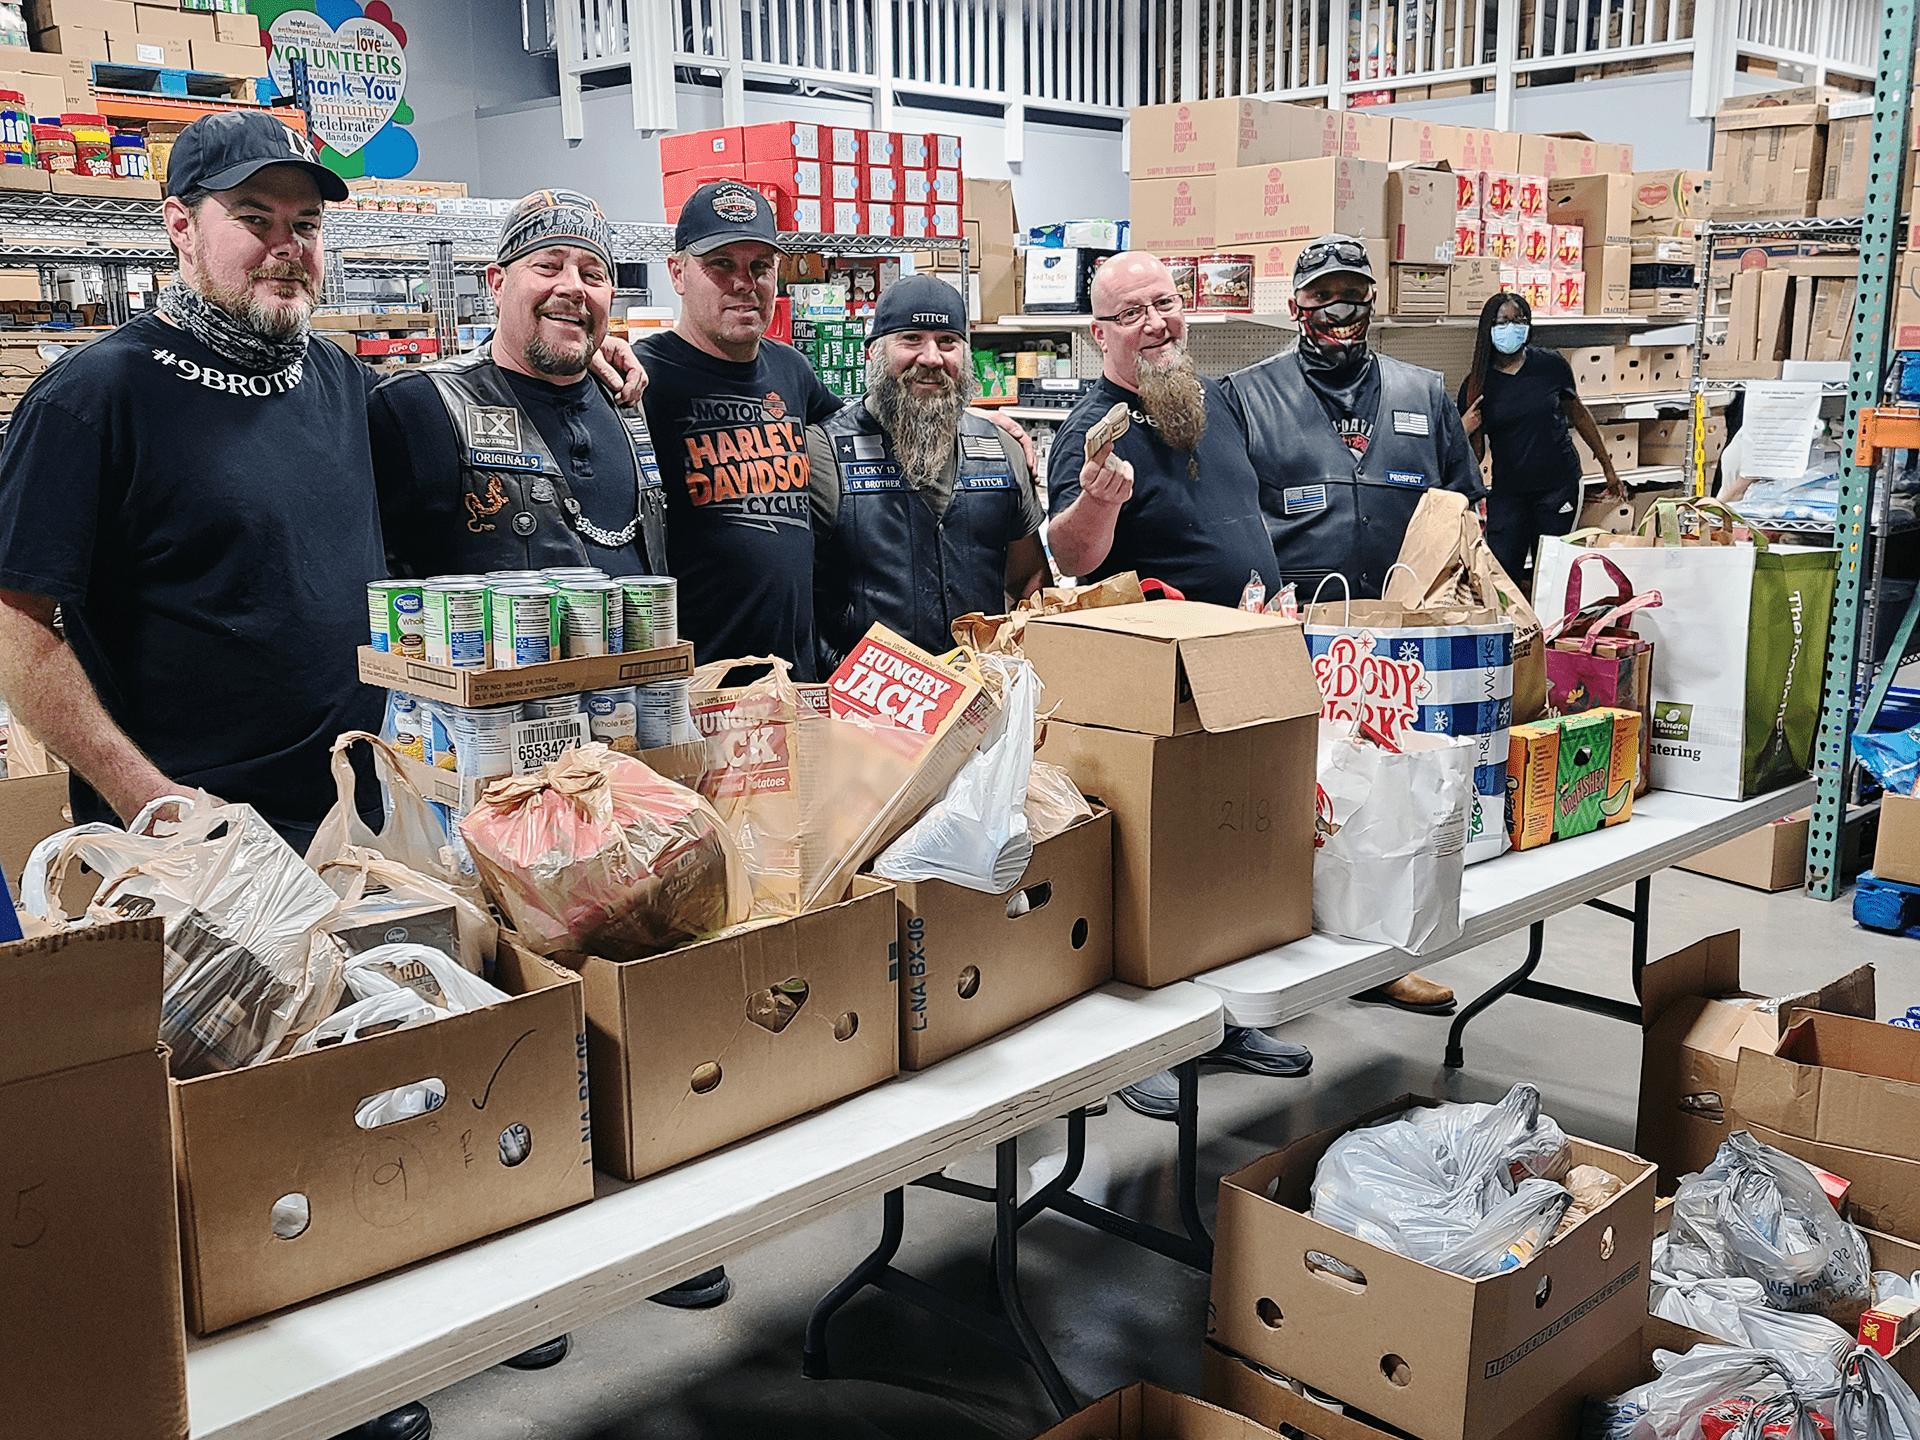 IX Brothers MC donates to Amazing Grace Food Pantry